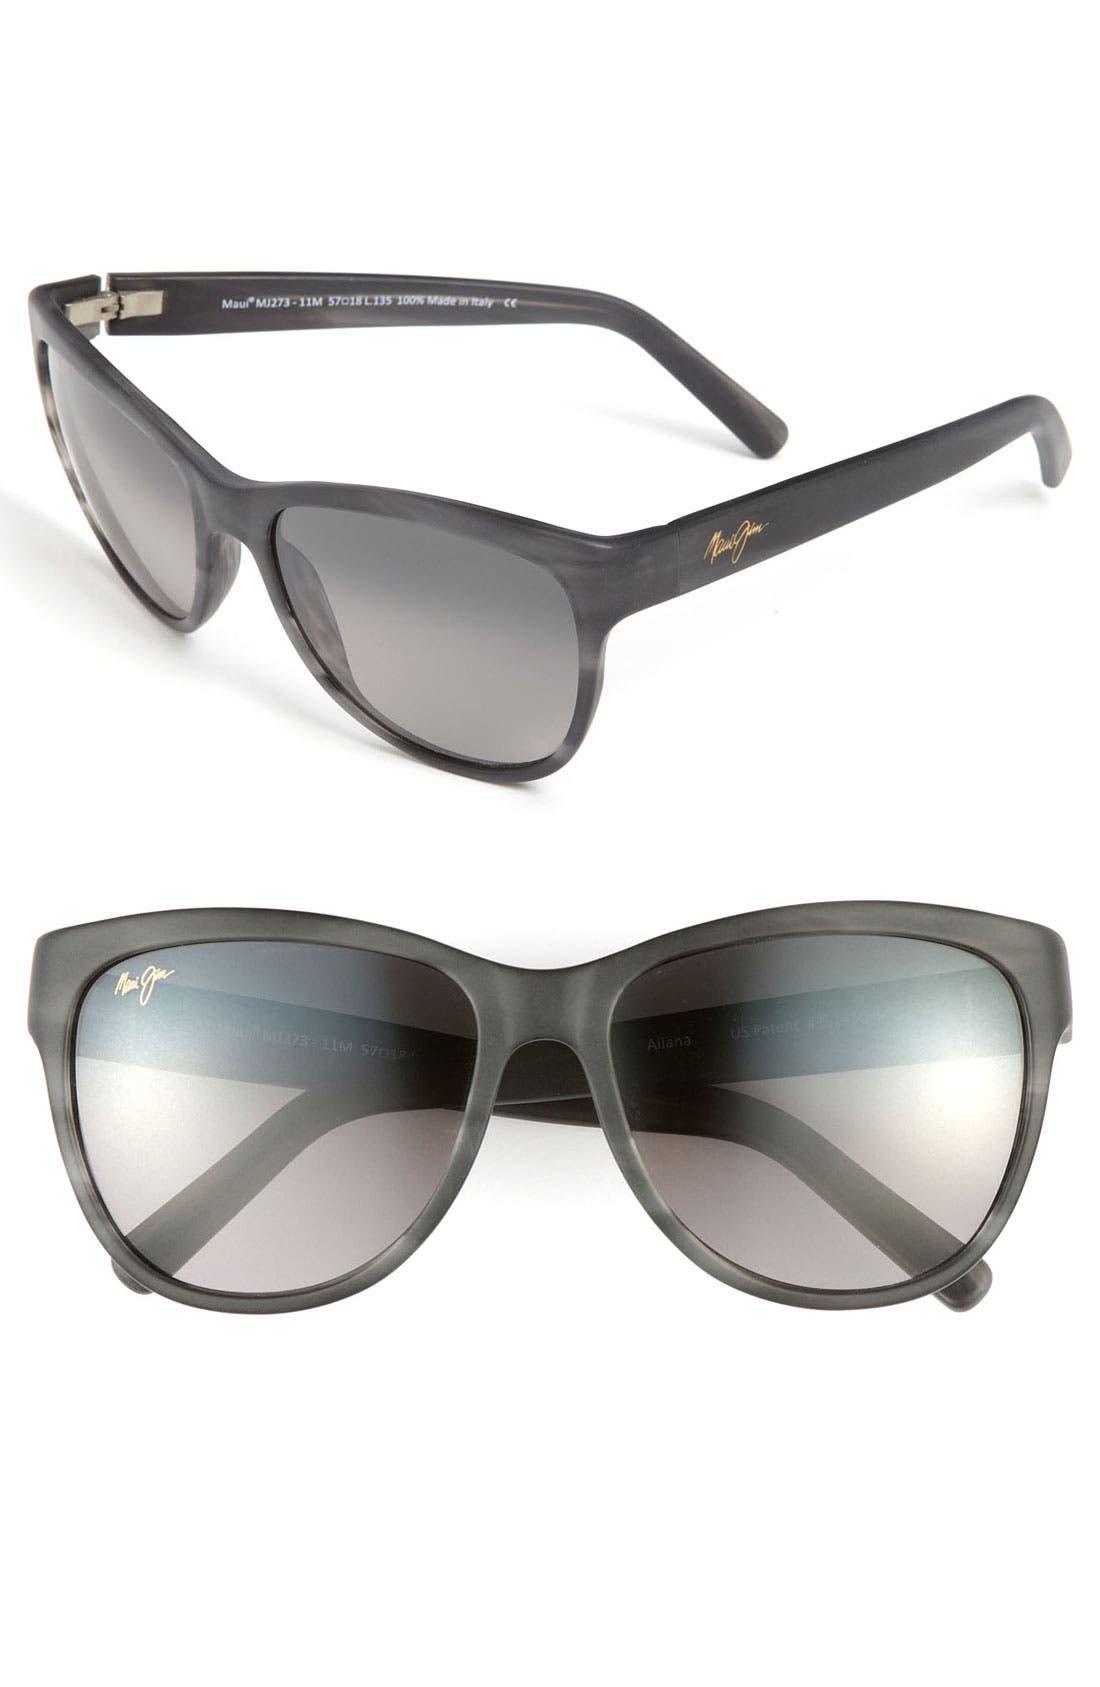 Alternate Image 1 Selected - Maui Jim 'Ailana' 57mm Sunglasses